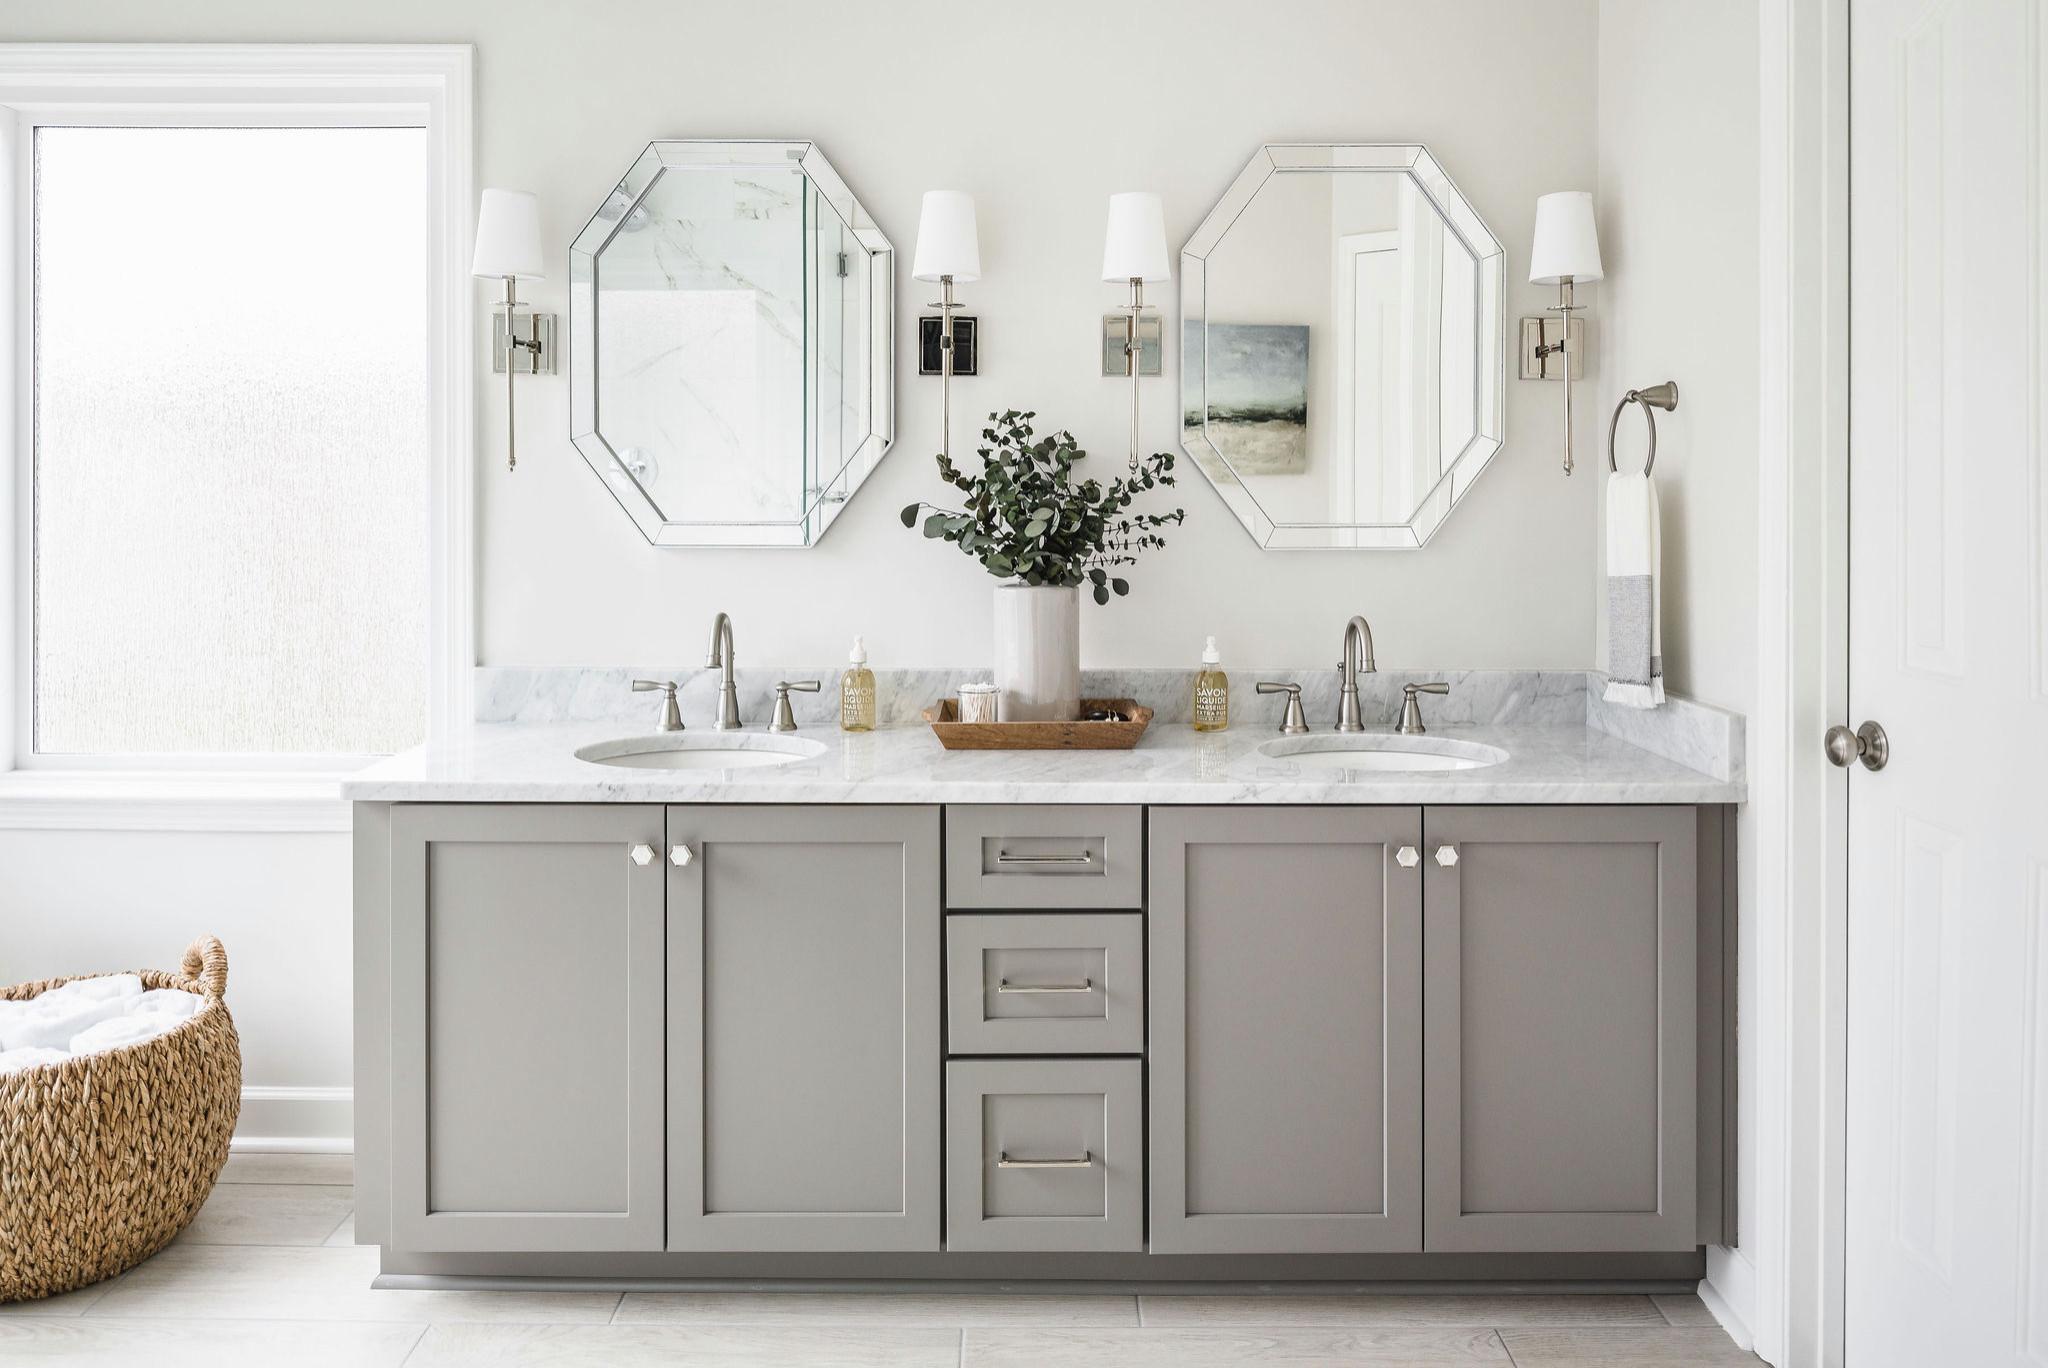 75 Beautiful Bathroom Pictures Ideas October 2020 Houzz